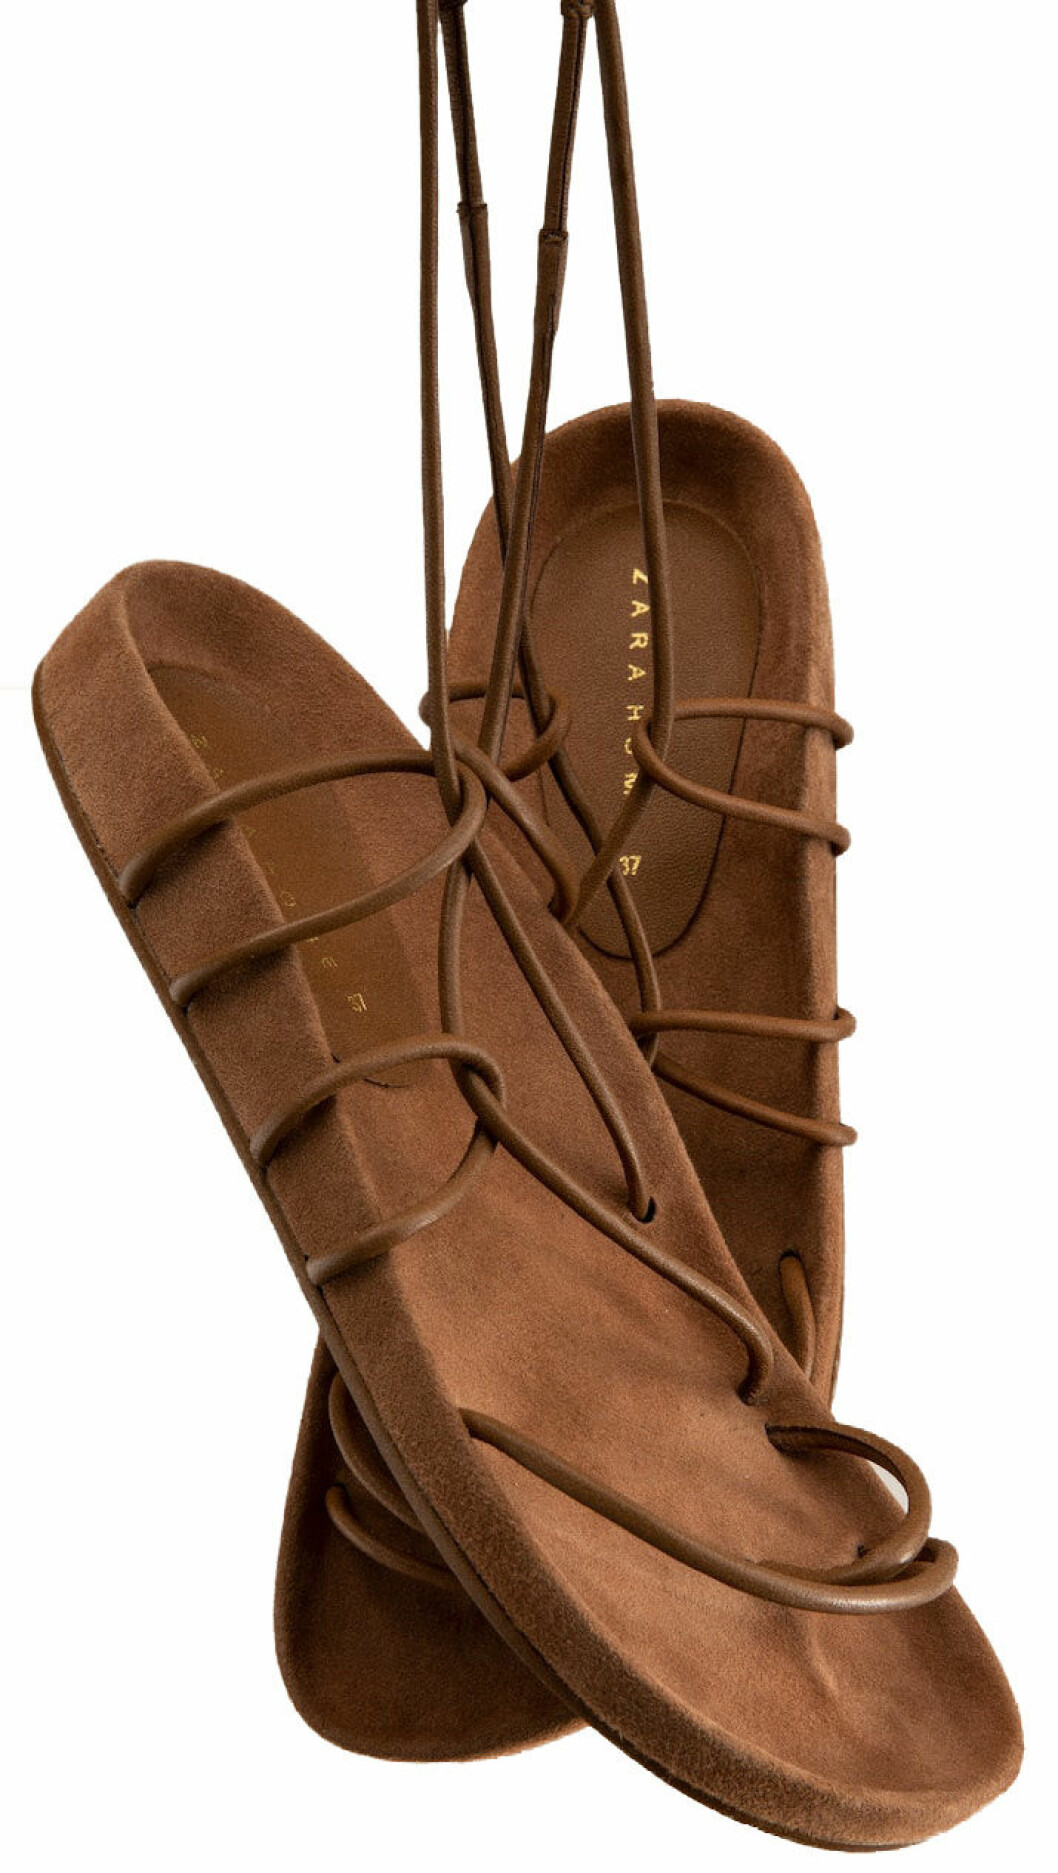 bruna sandaler från Zara home.